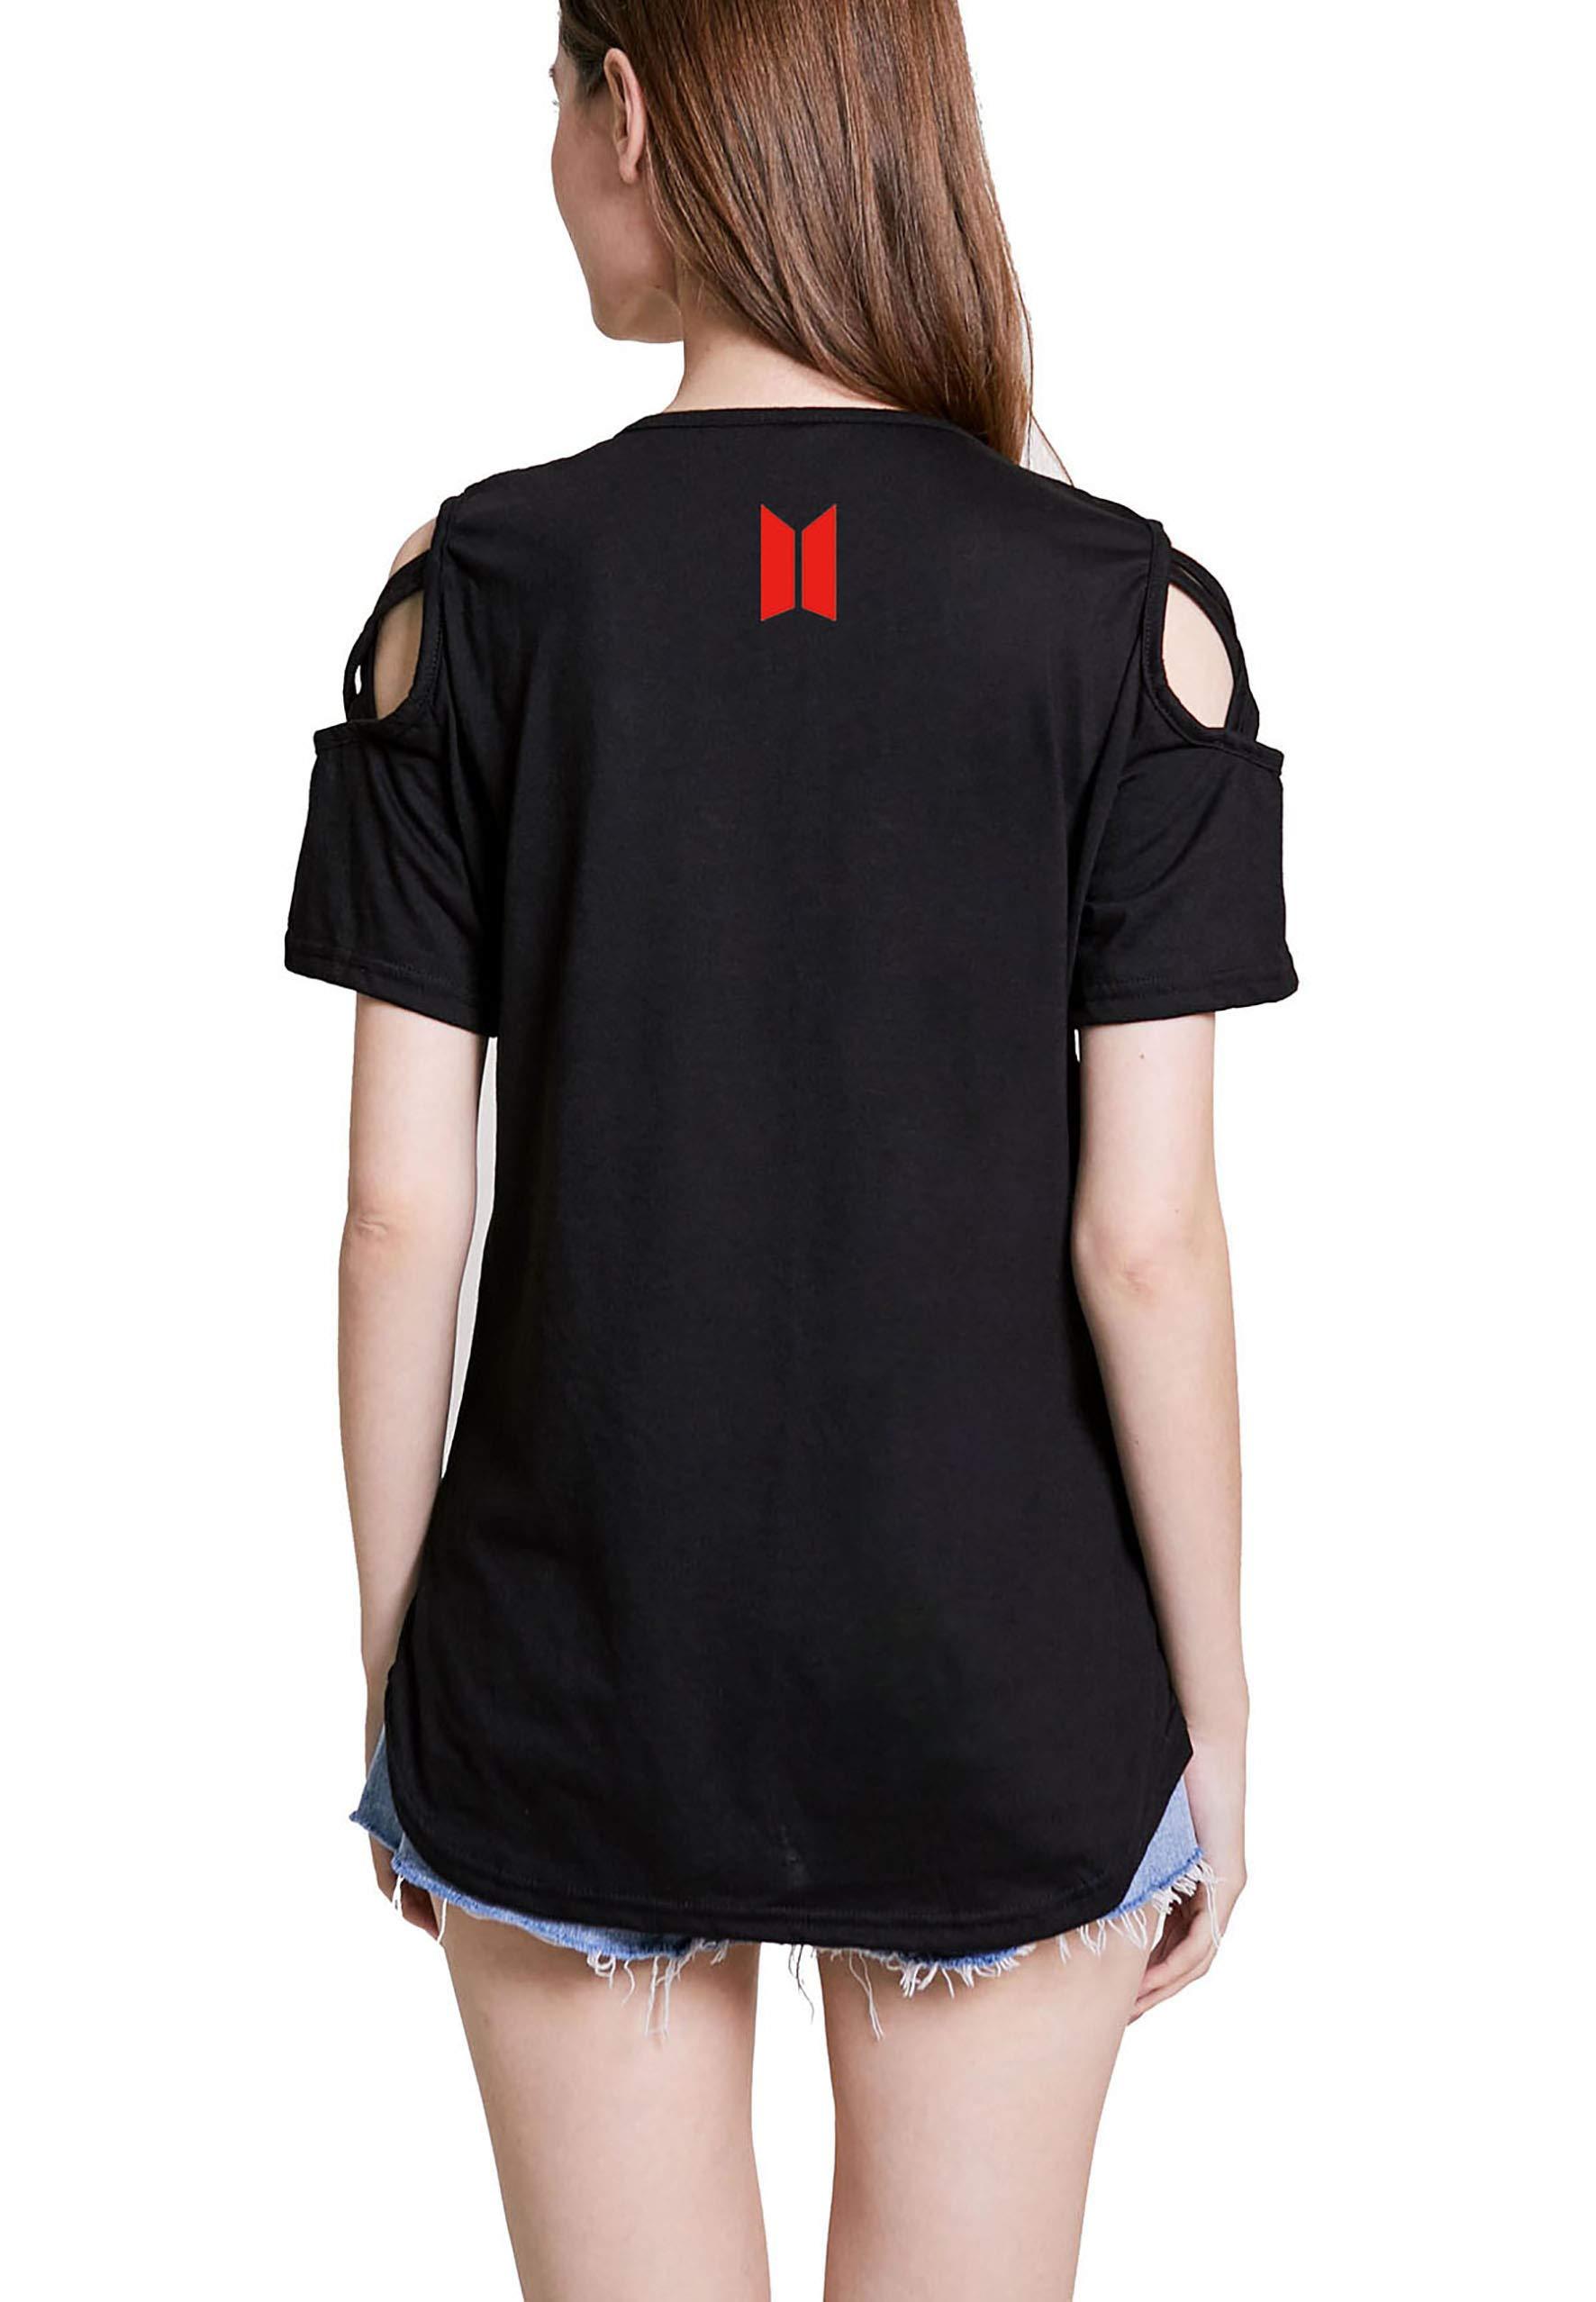 babyhealthy BTS World Tour Music Concert T-Shirt Jung Kook Jimin Suga V Jin Tee Shirt Tops